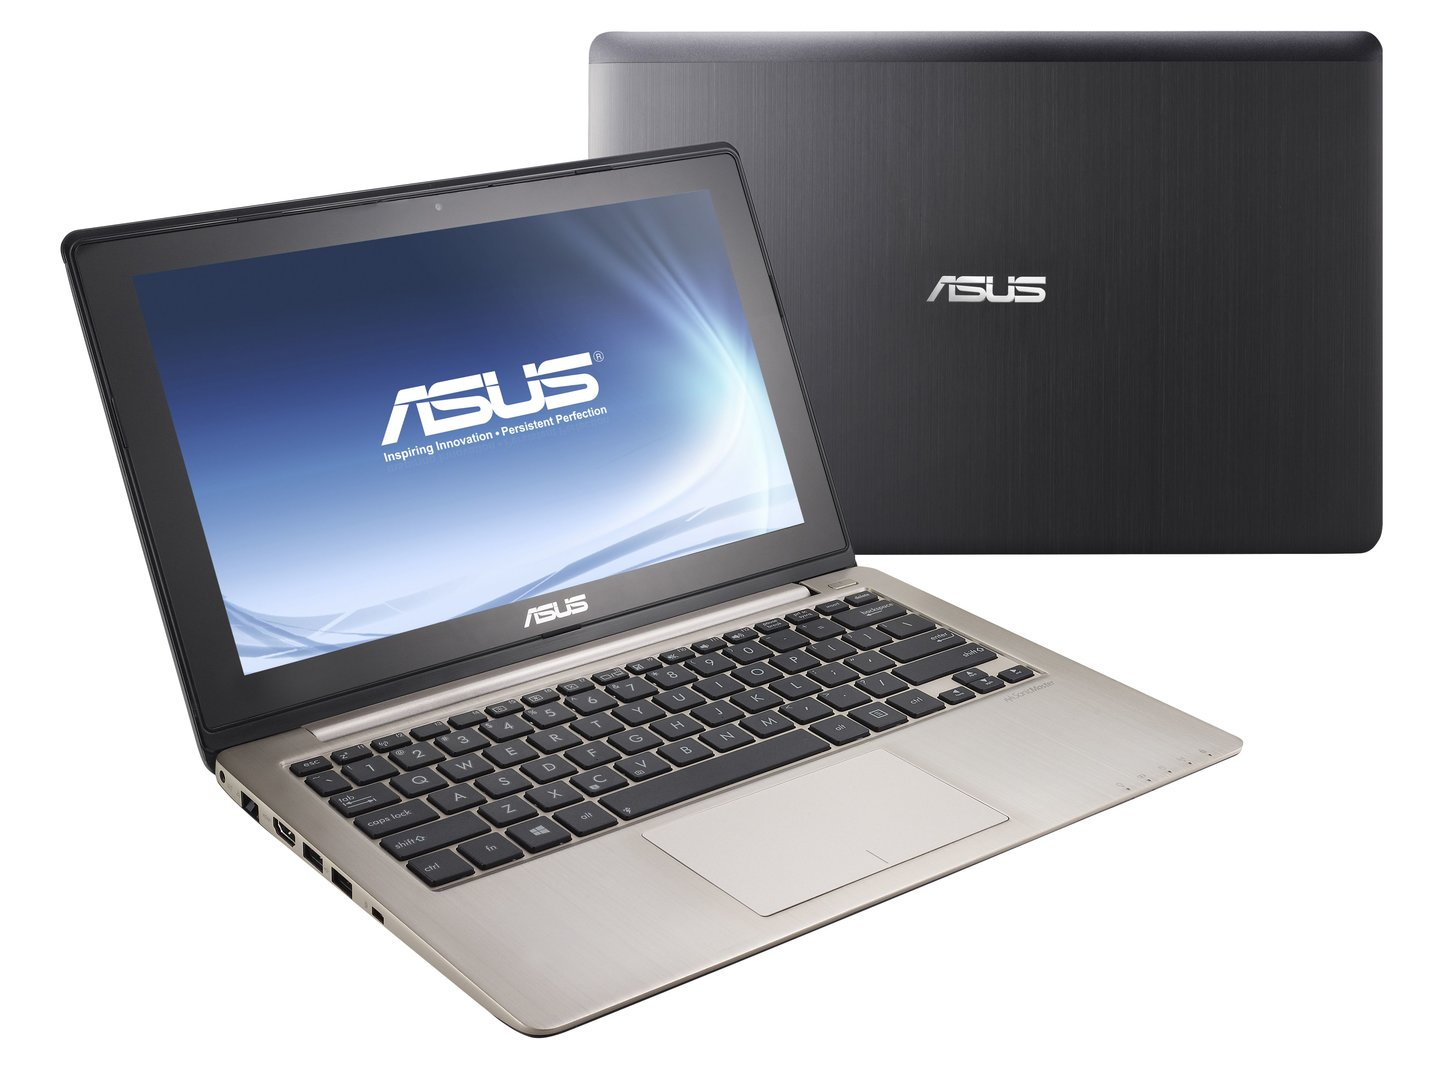 Asus Vivo Book S200